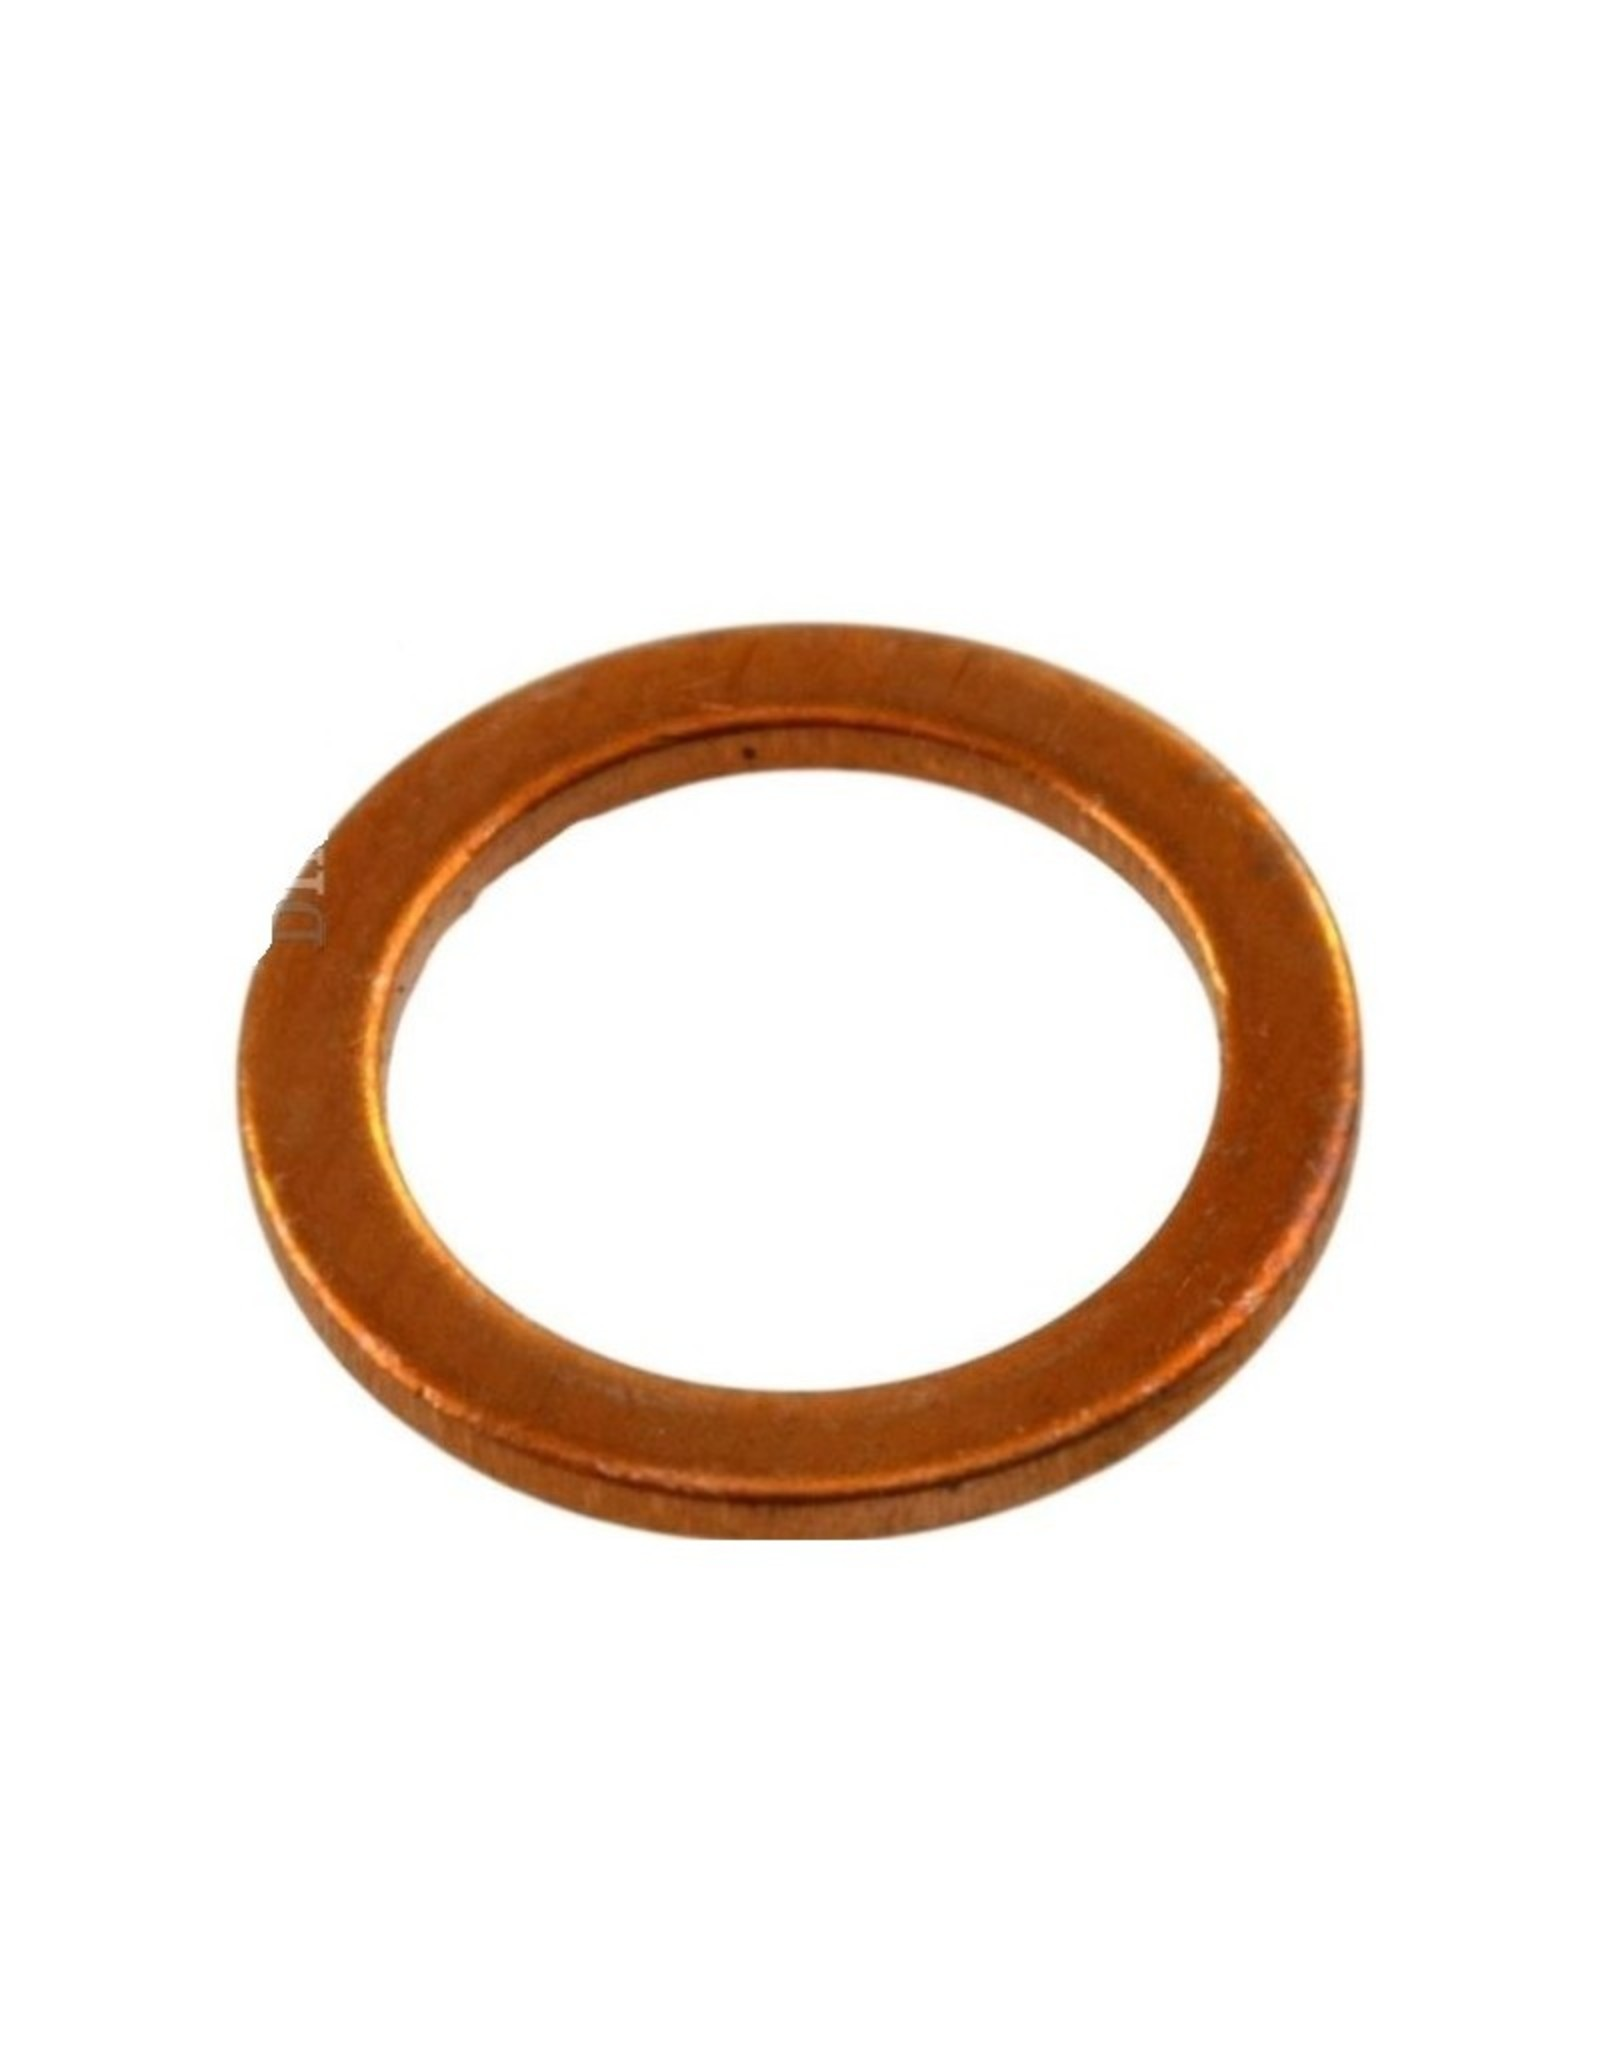 DUCATI Ducati copper washer / gasket; 10x14x1 mm